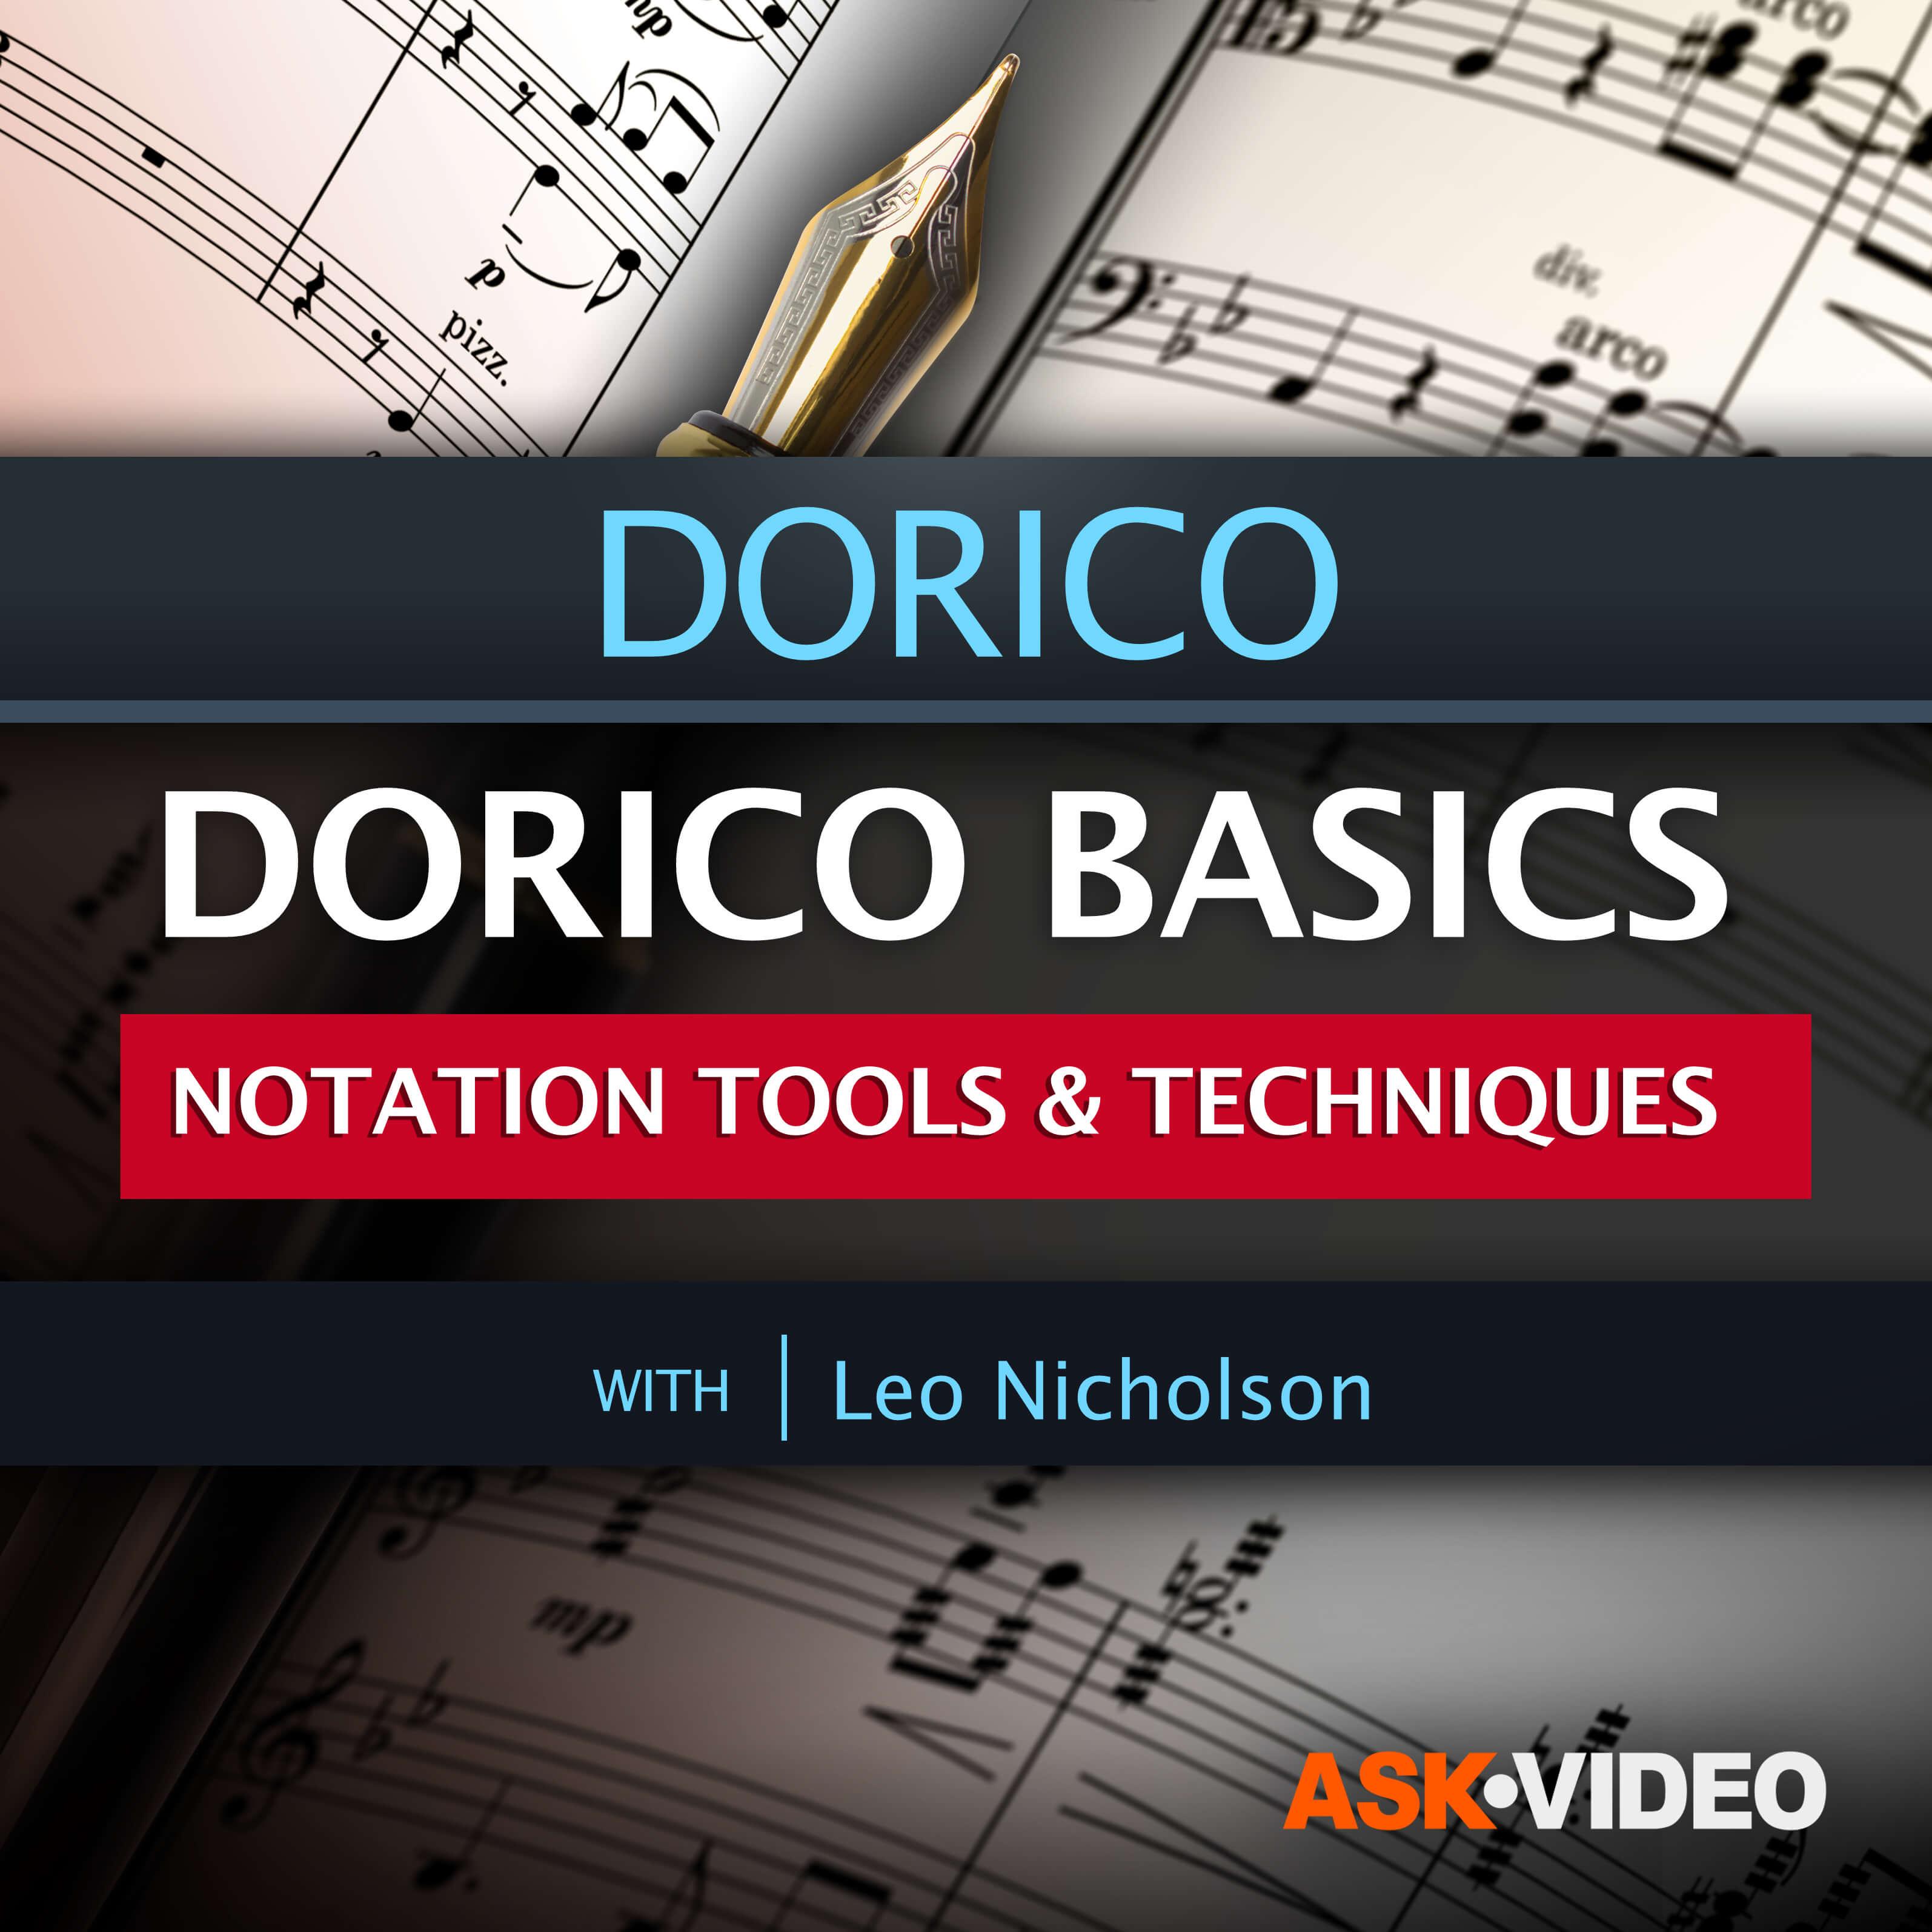 Dorico Basics: Notation Tools and Techniques